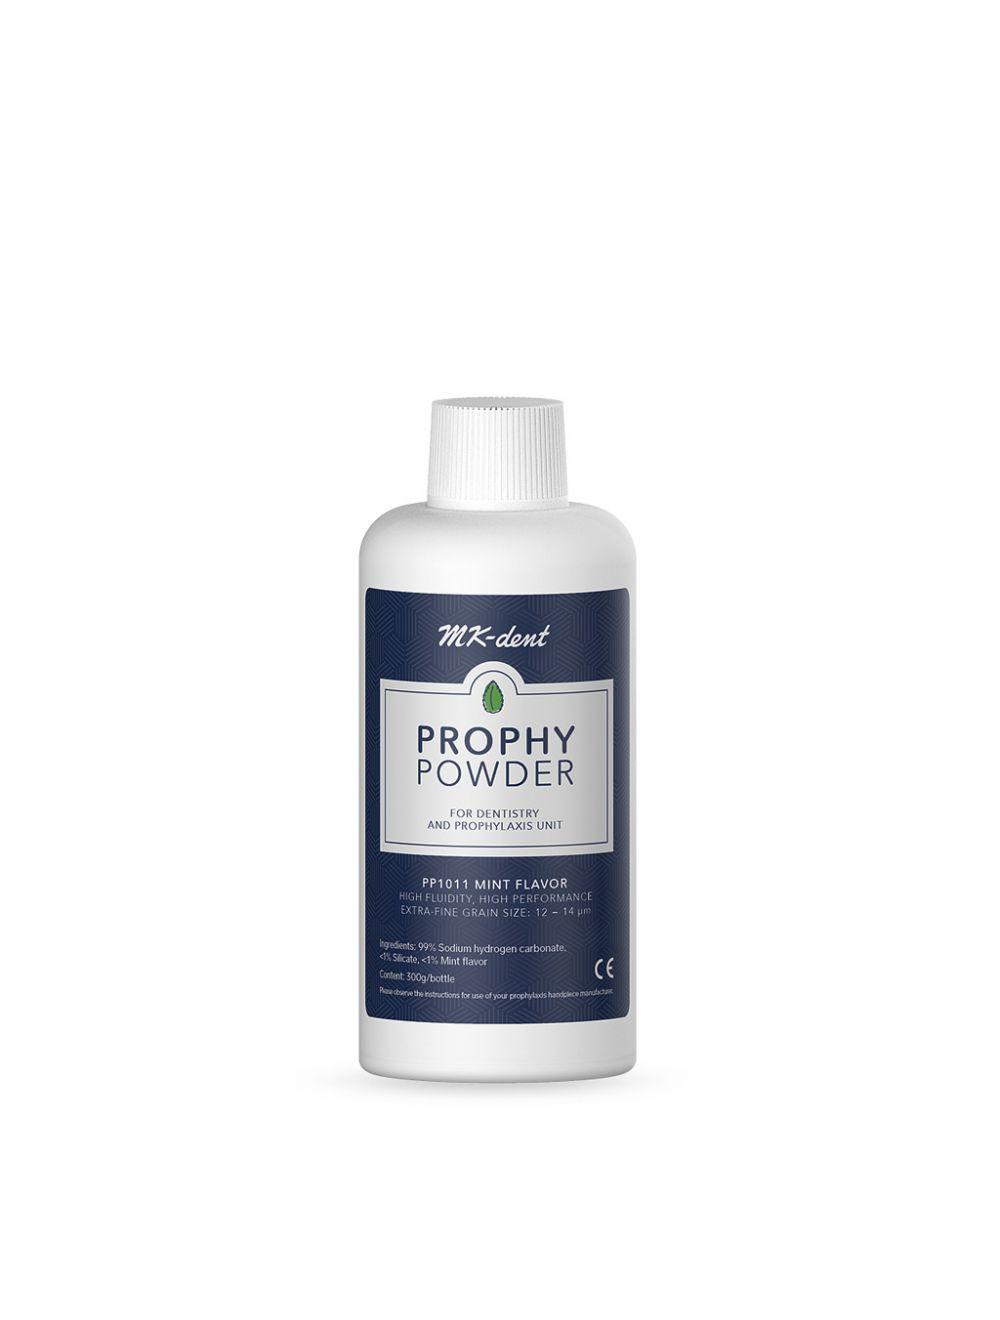 MK-dent Prophy Powder Minze PP1011